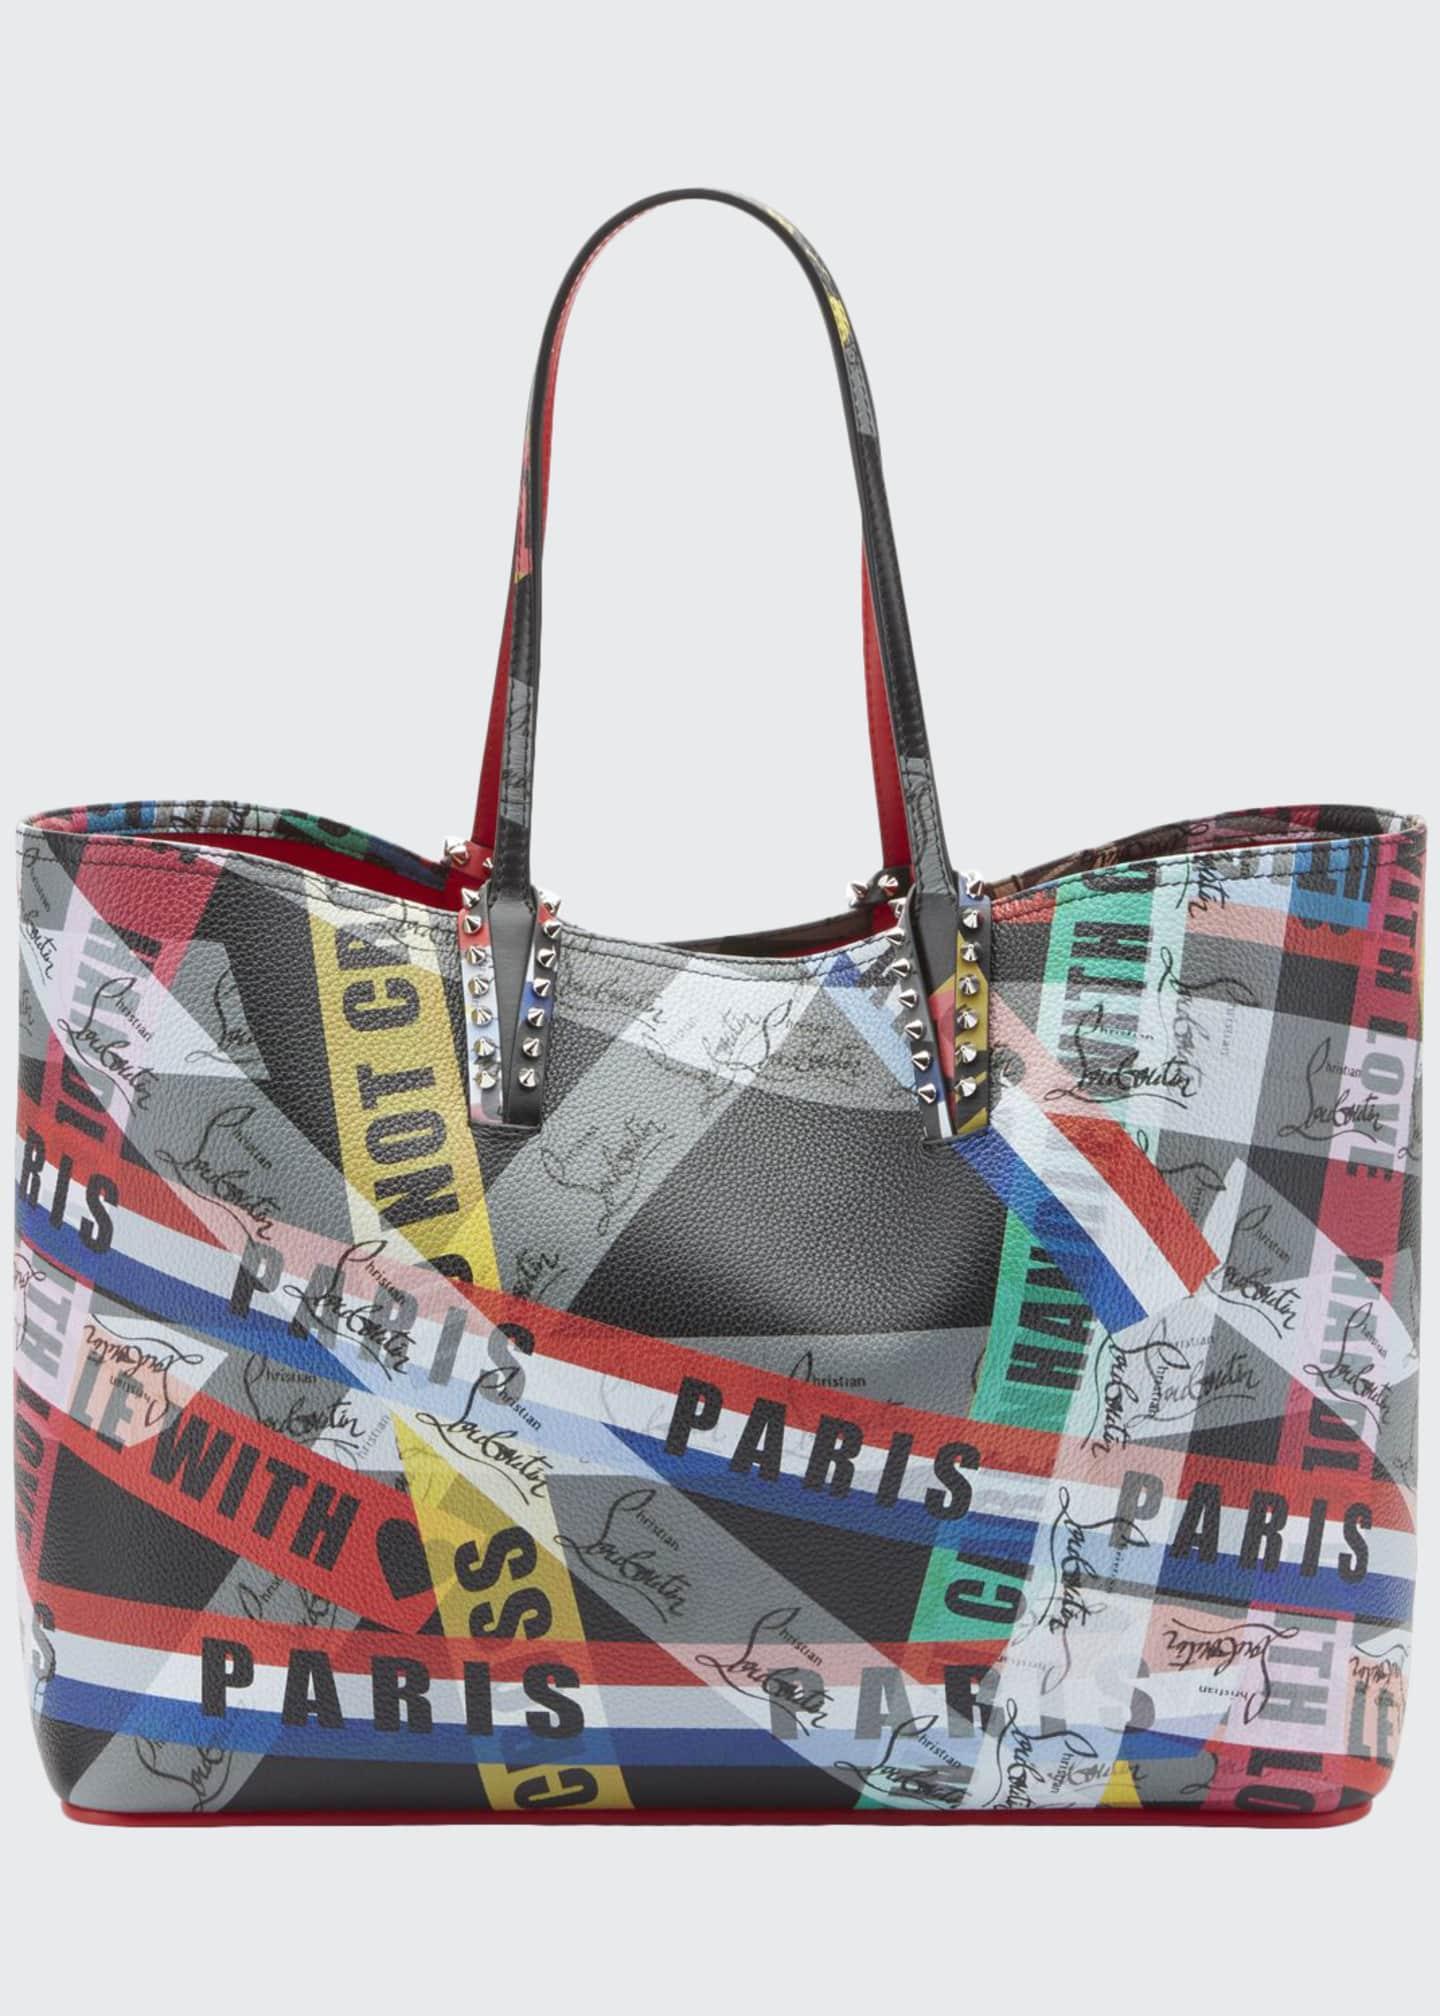 Christian Louboutin Cabata Calf LoubiBallage Tote Bag